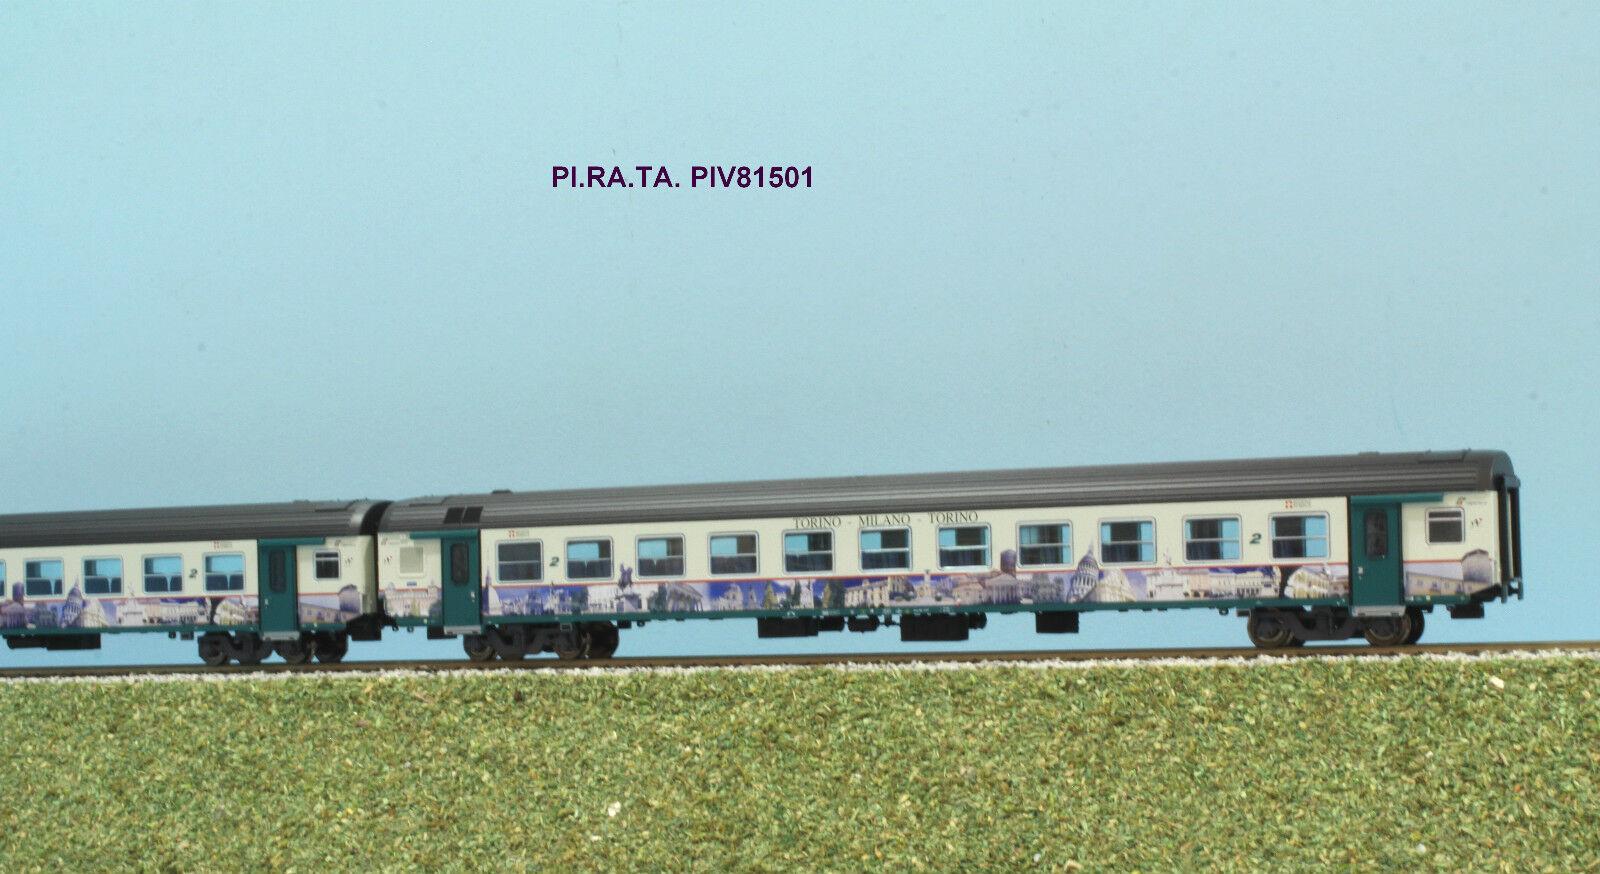 PI.RA.TA PIV 81501 FS set 2 carrozze MDVE  FS livrea regionale Piemonte TO-MI-TO